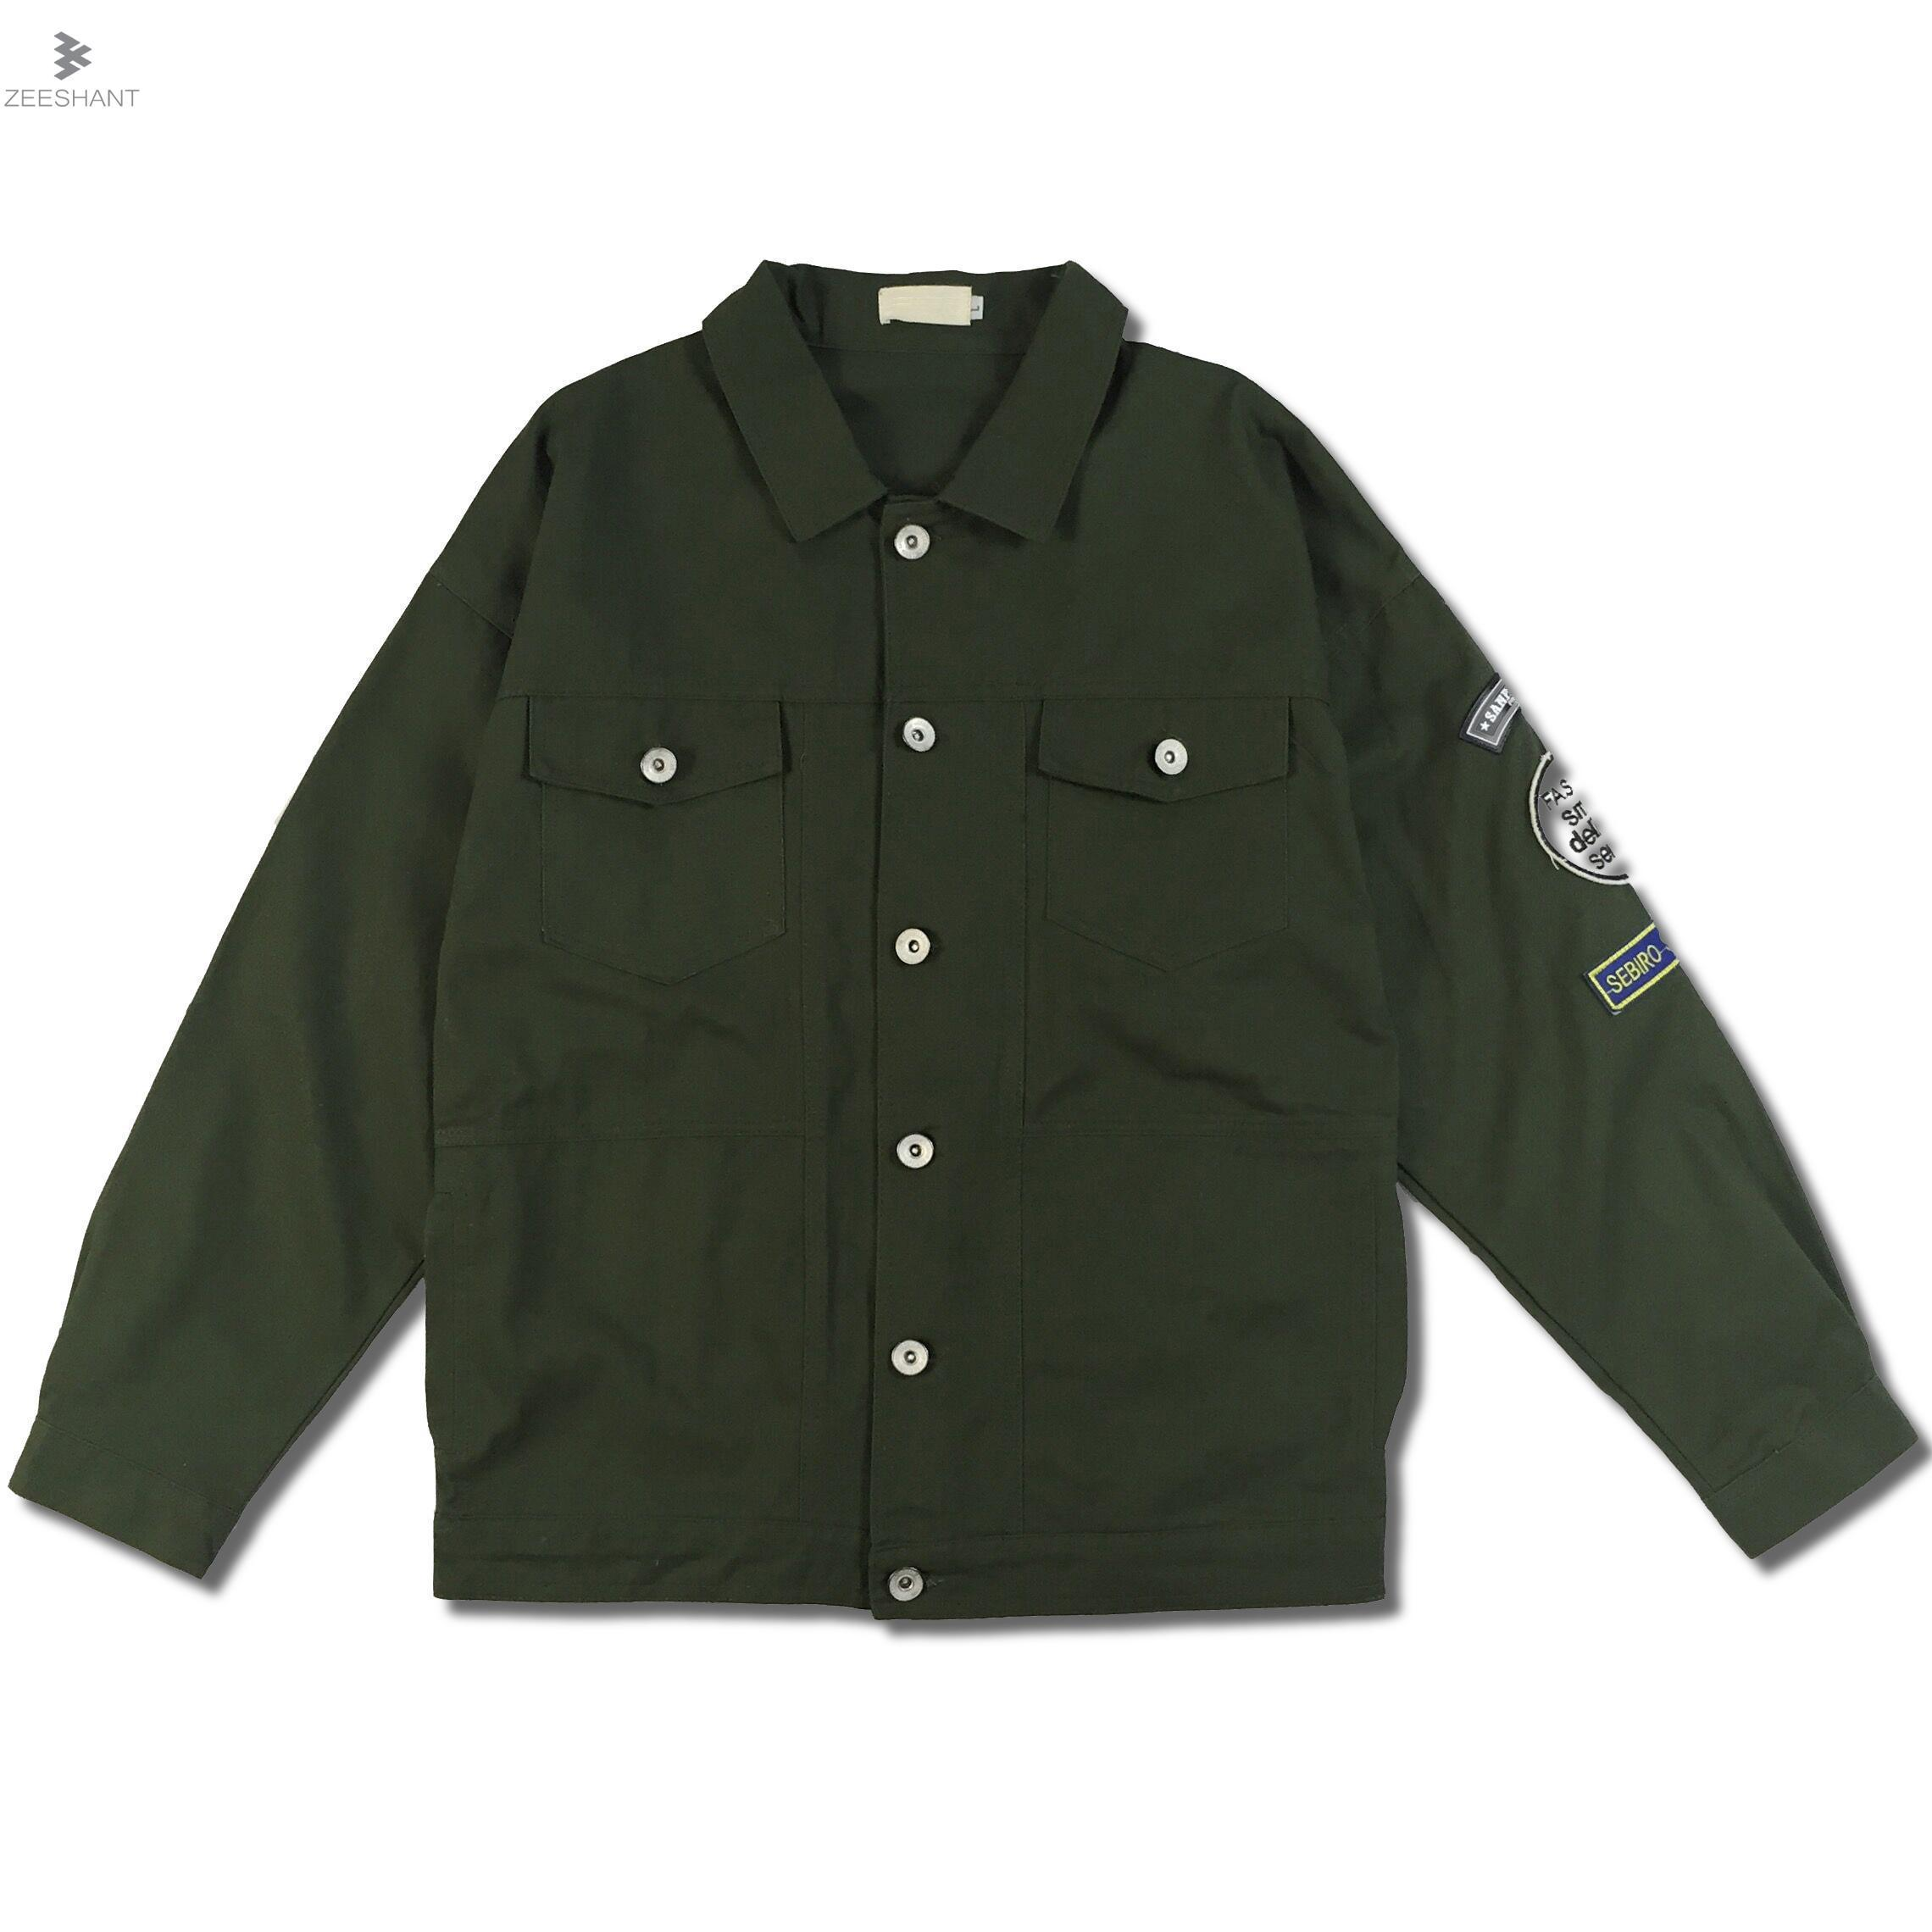 ZEESHANT Casual Windbreaker Men' s Thin Jackets Spring Trench Baseball Jackets Coat Lightweight Jacket Men Chaquetas Hombre